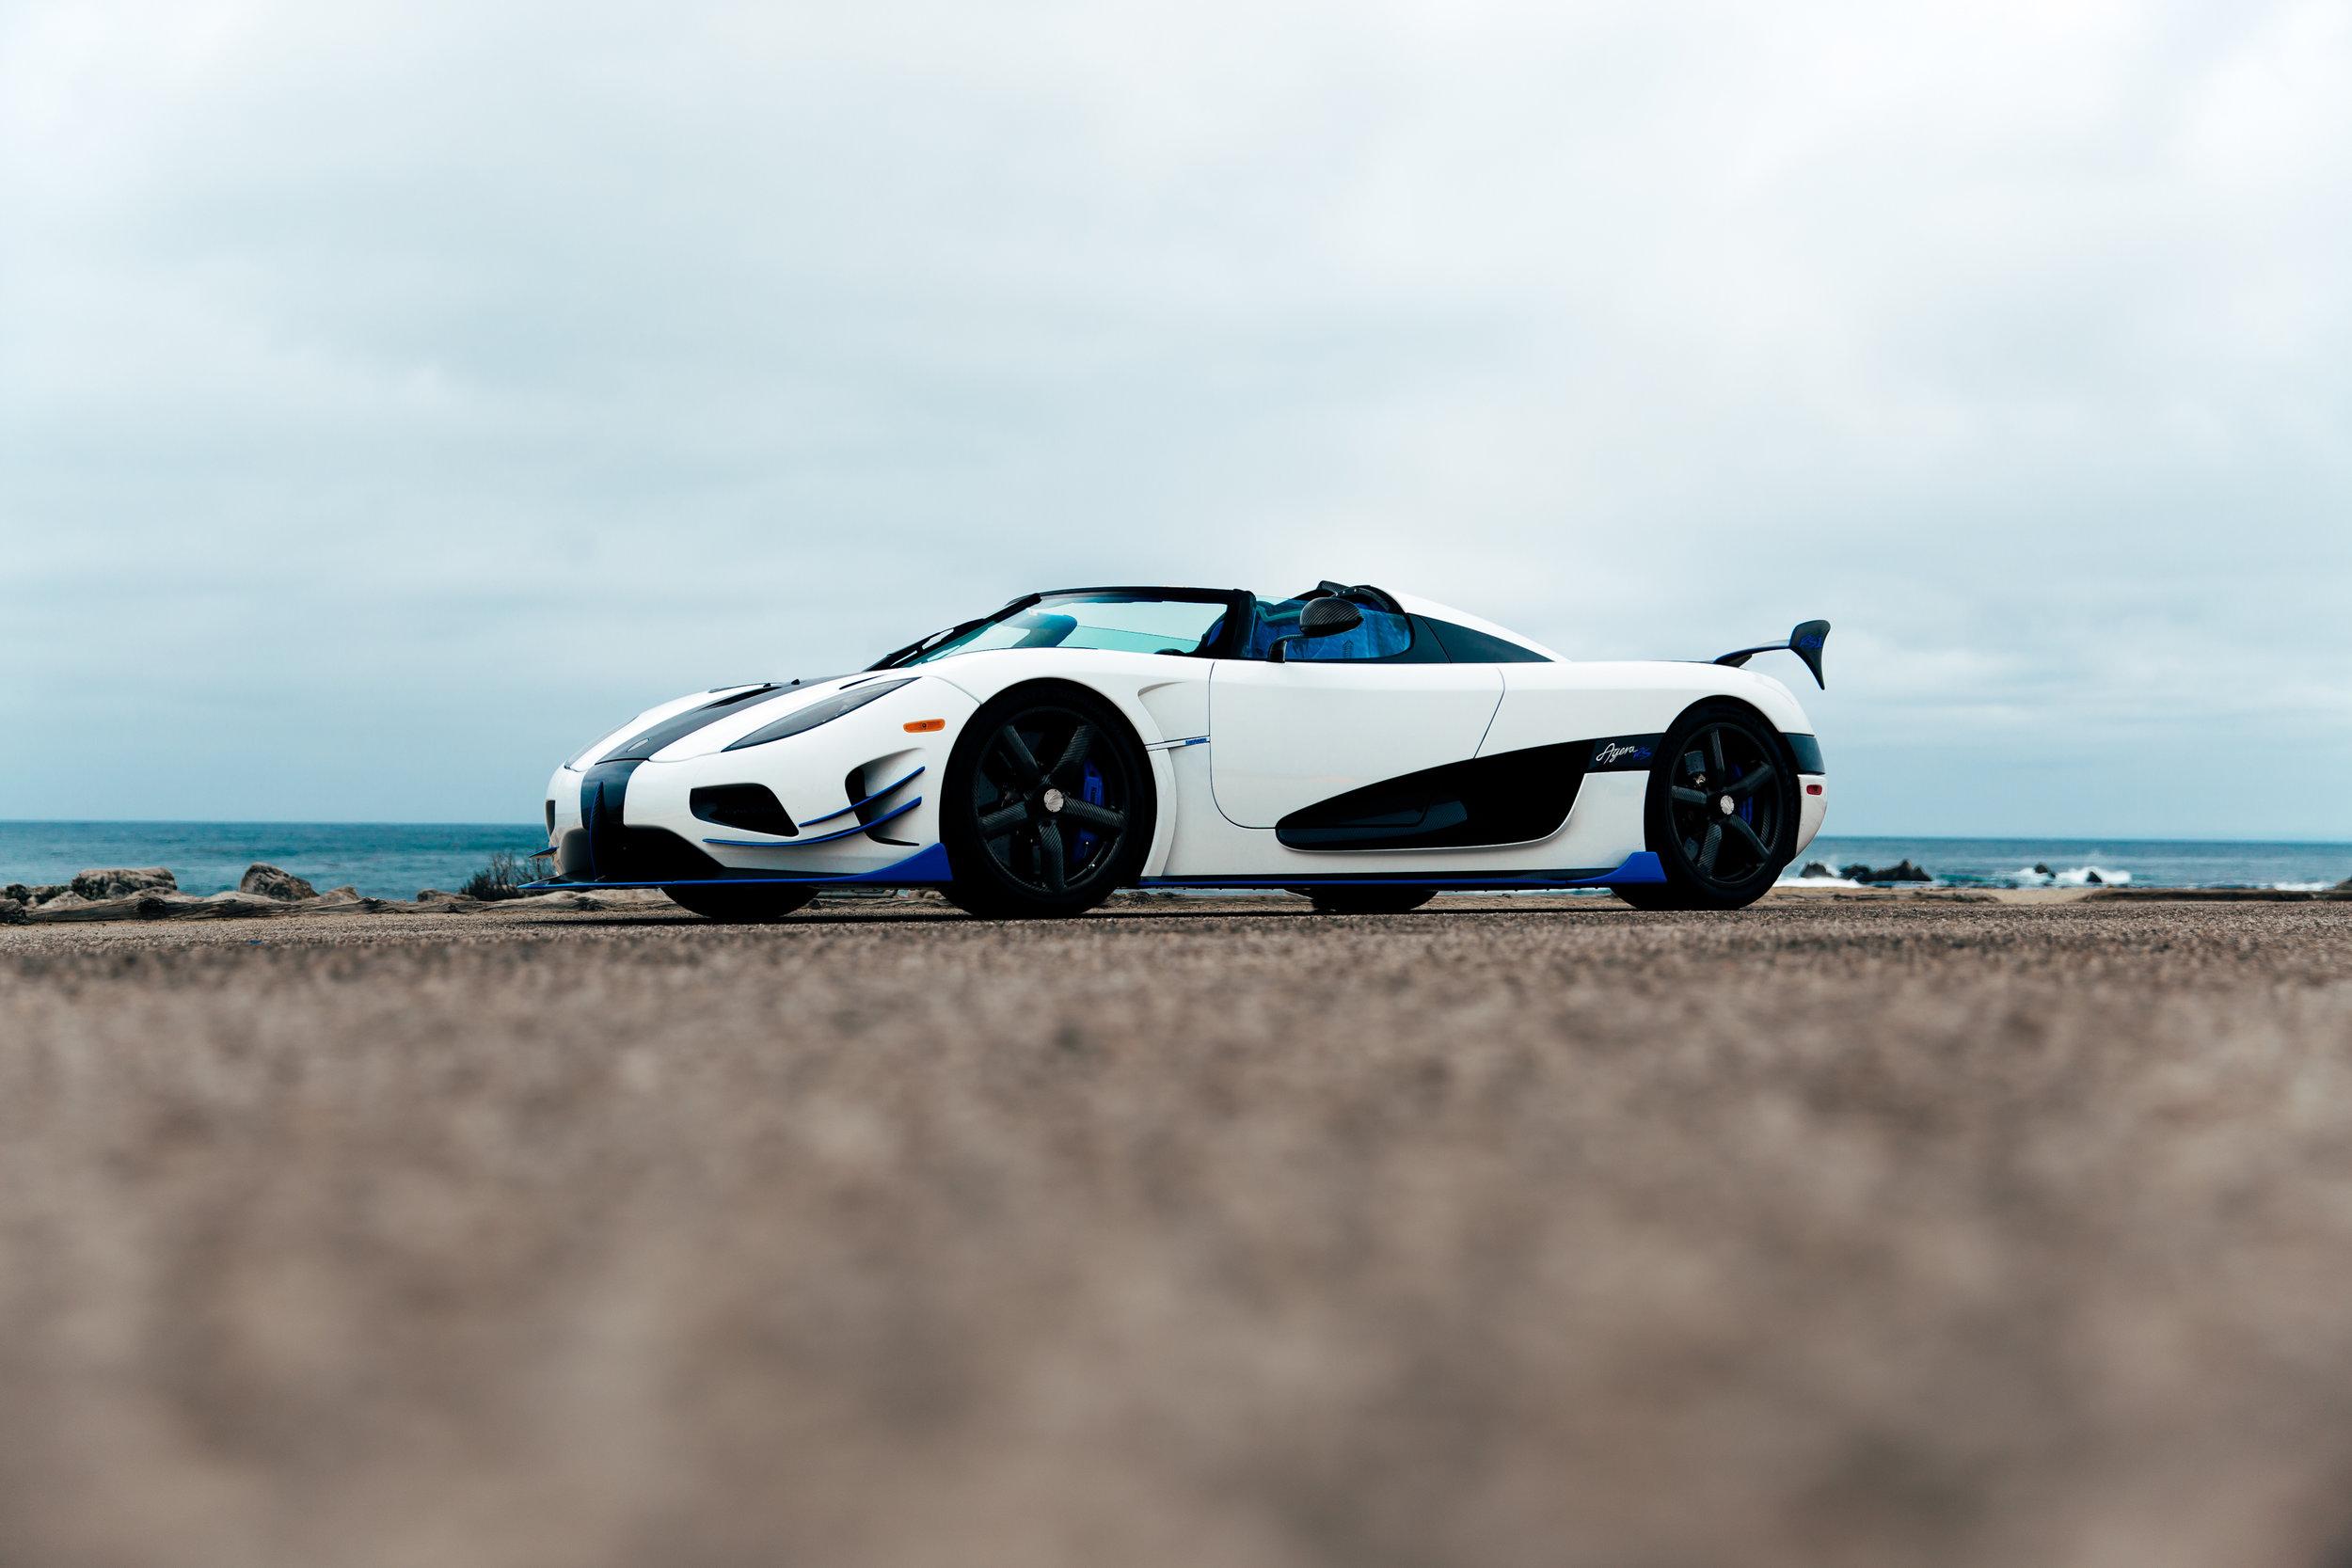 Stay_Driven_Monterey_Car_Week_Whitesse_Koenigsegg-15.jpg